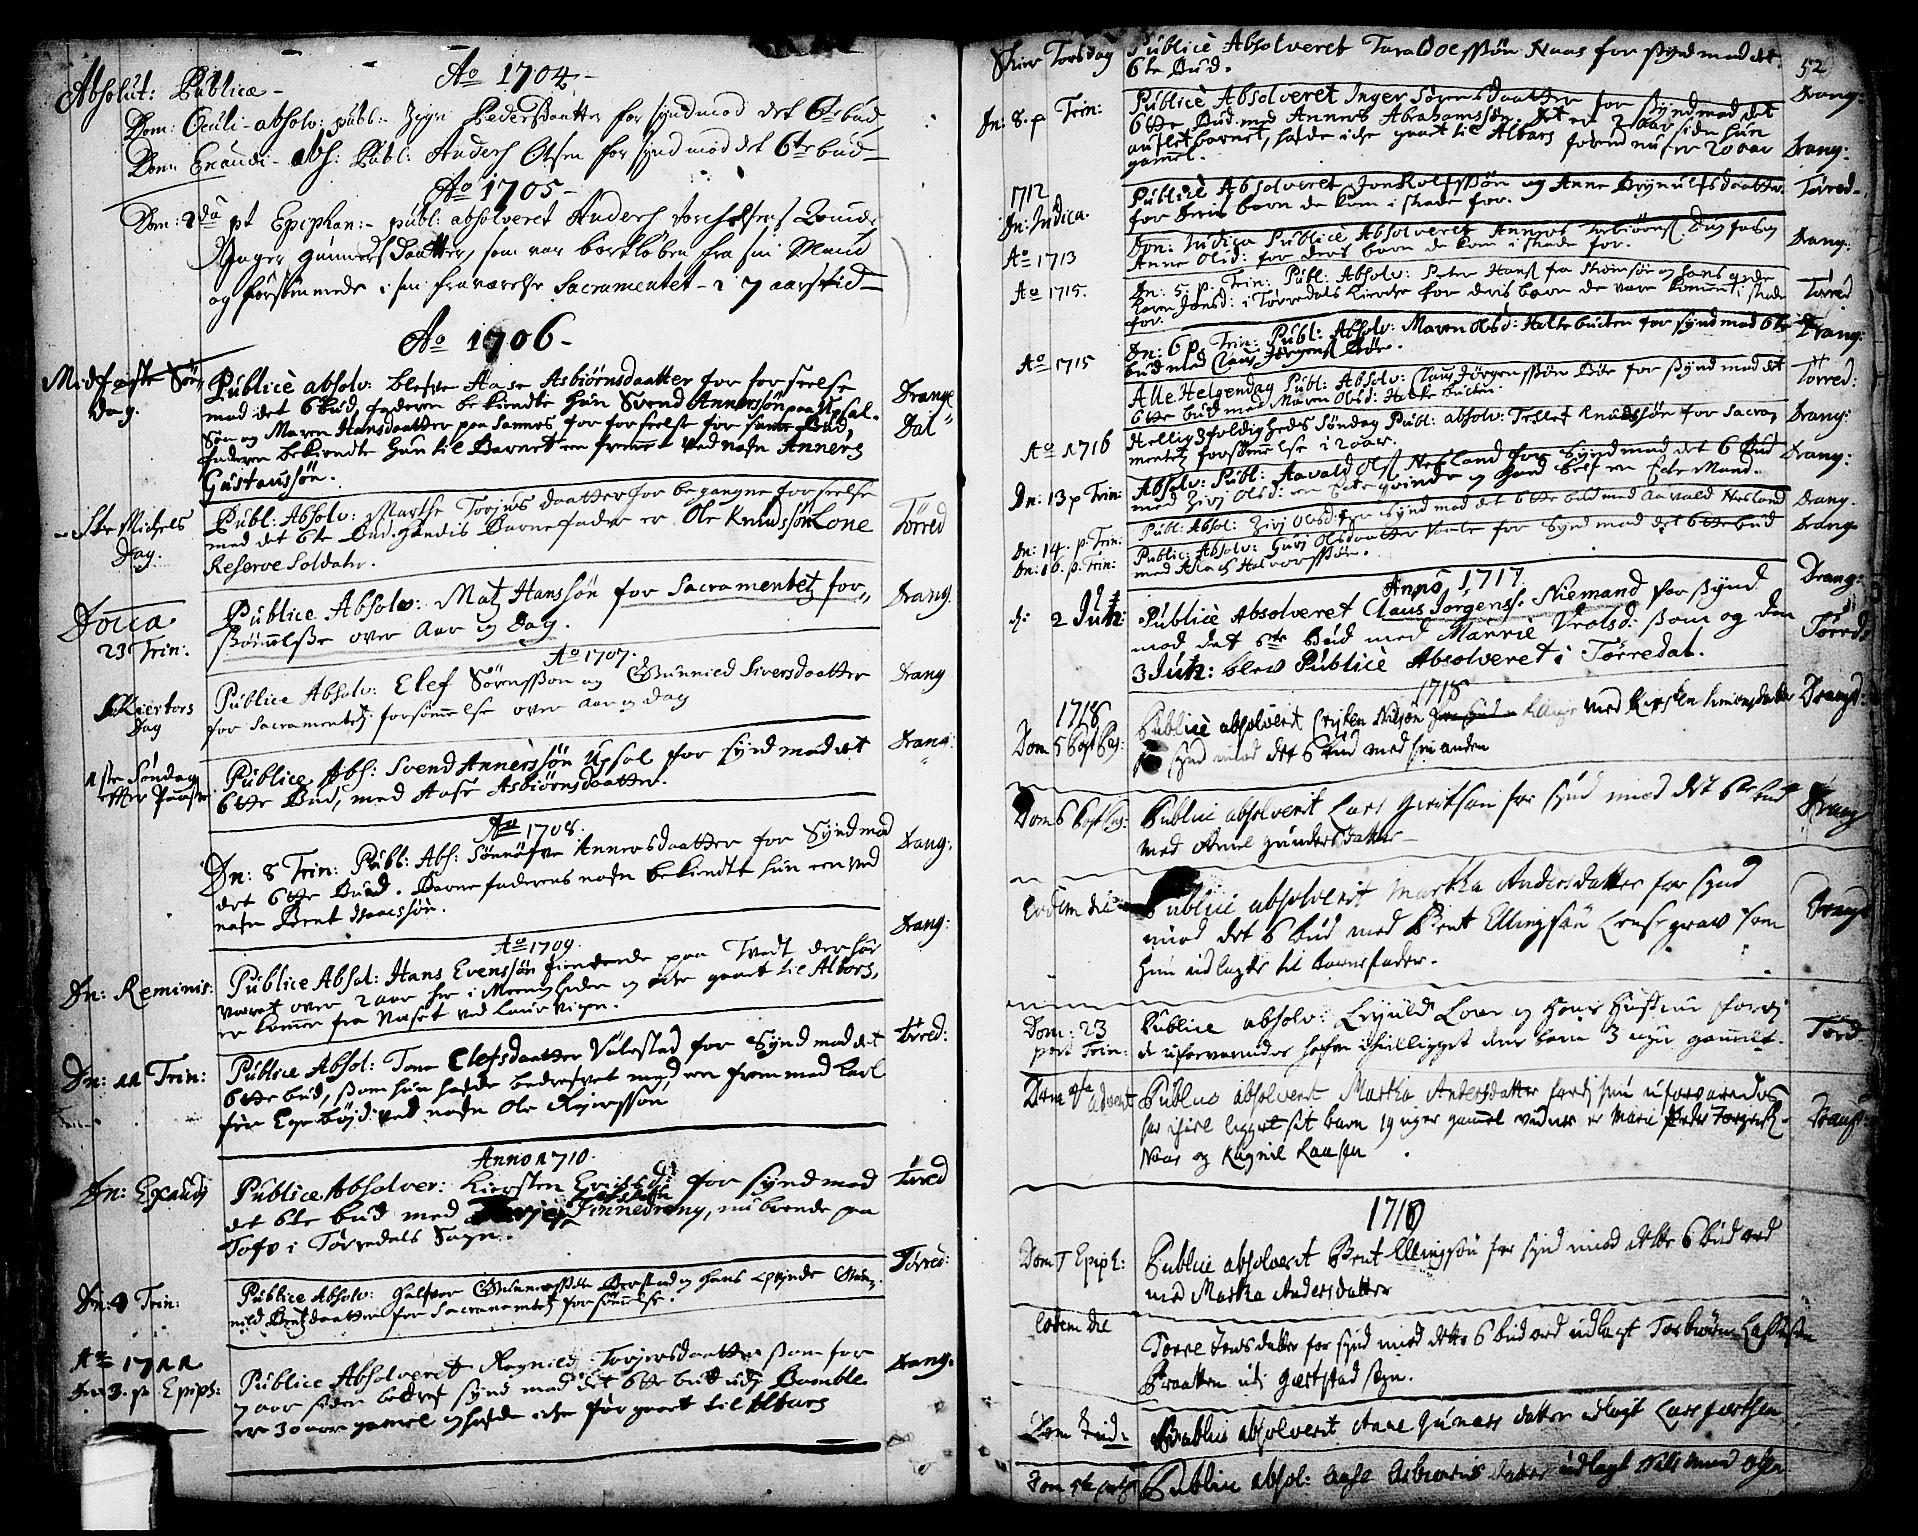 SAKO, Drangedal kirkebøker, F/Fa/L0001: Ministerialbok nr. 1, 1697-1767, s. 52